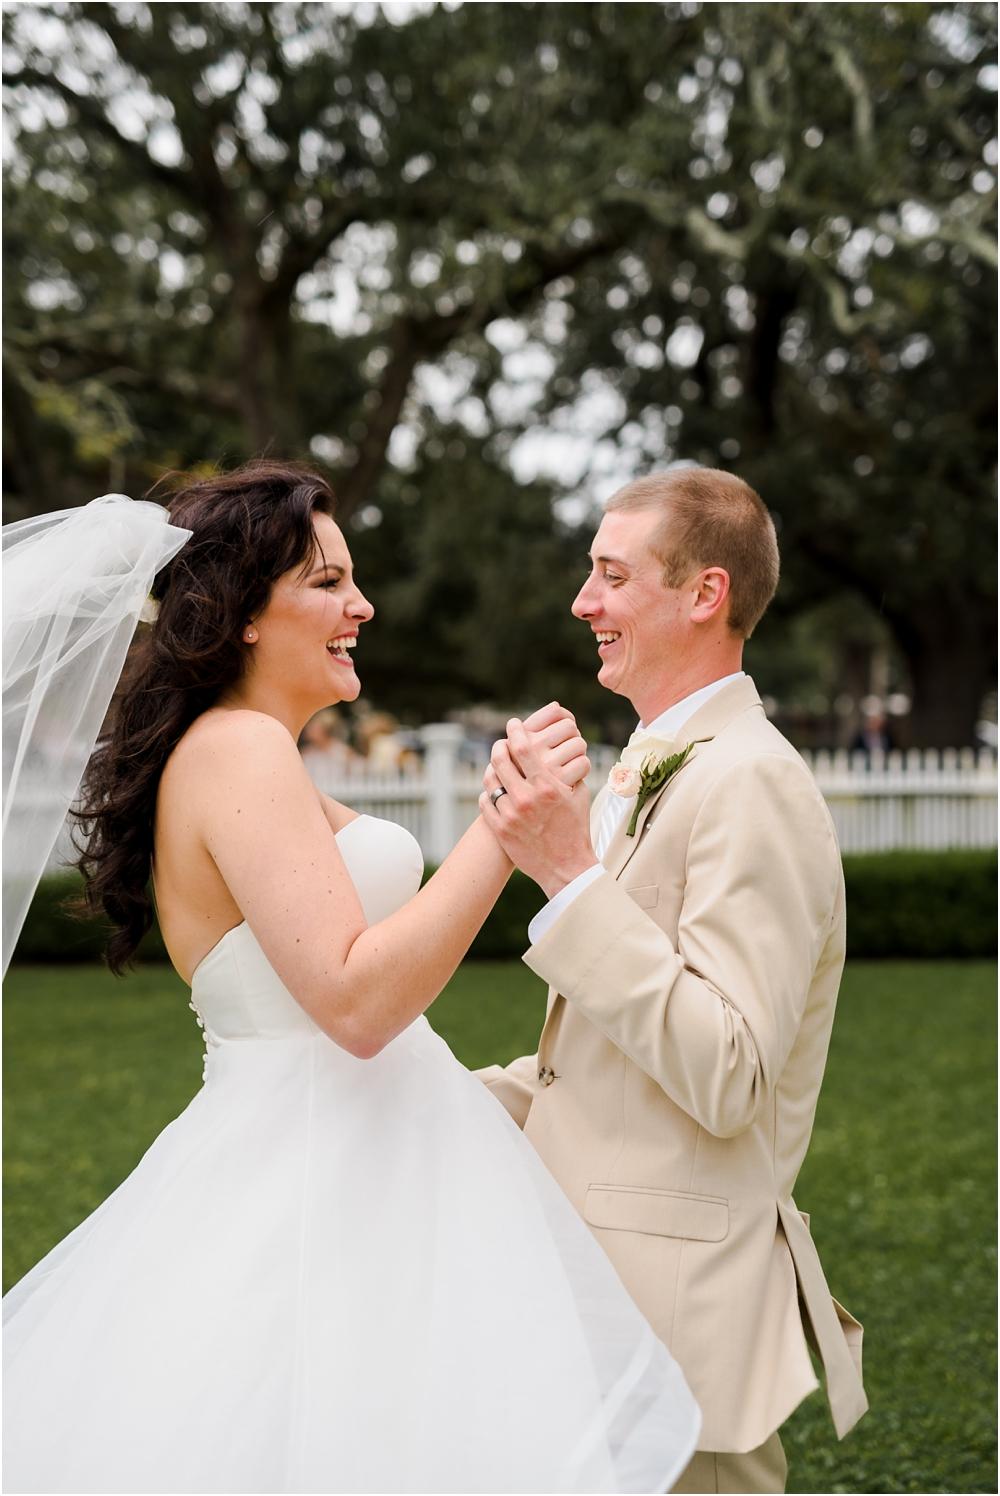 pensacola-wedding-photographer-kiersten-grant-106.jpg